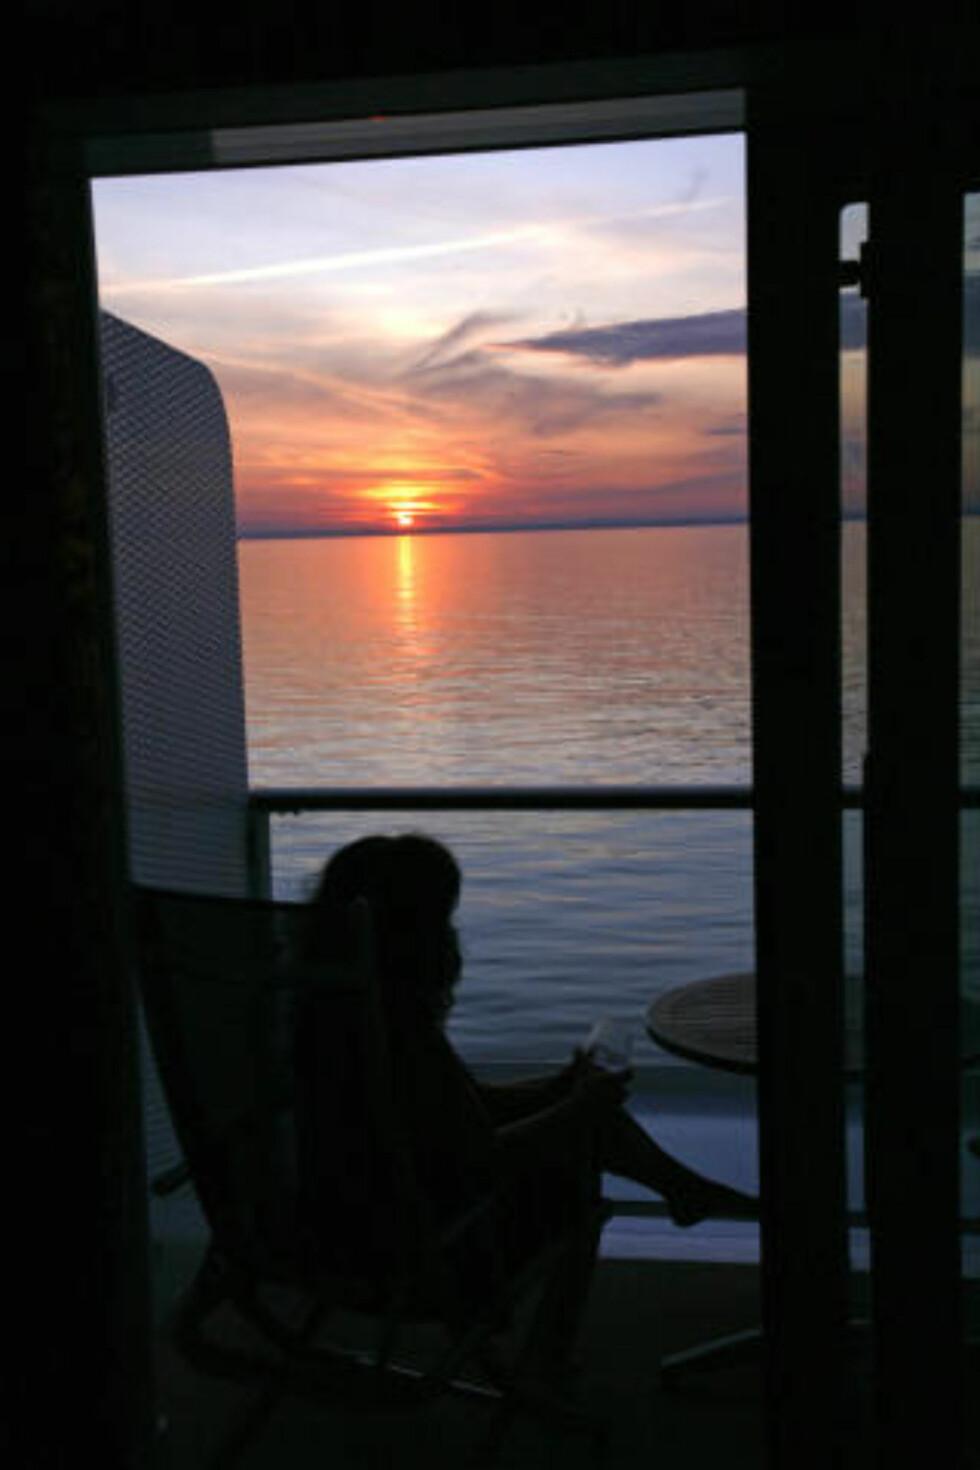 PERLEKYSTEN: Sørlandskysten er ikke imponerende, kun idyllisk i solnedgang.